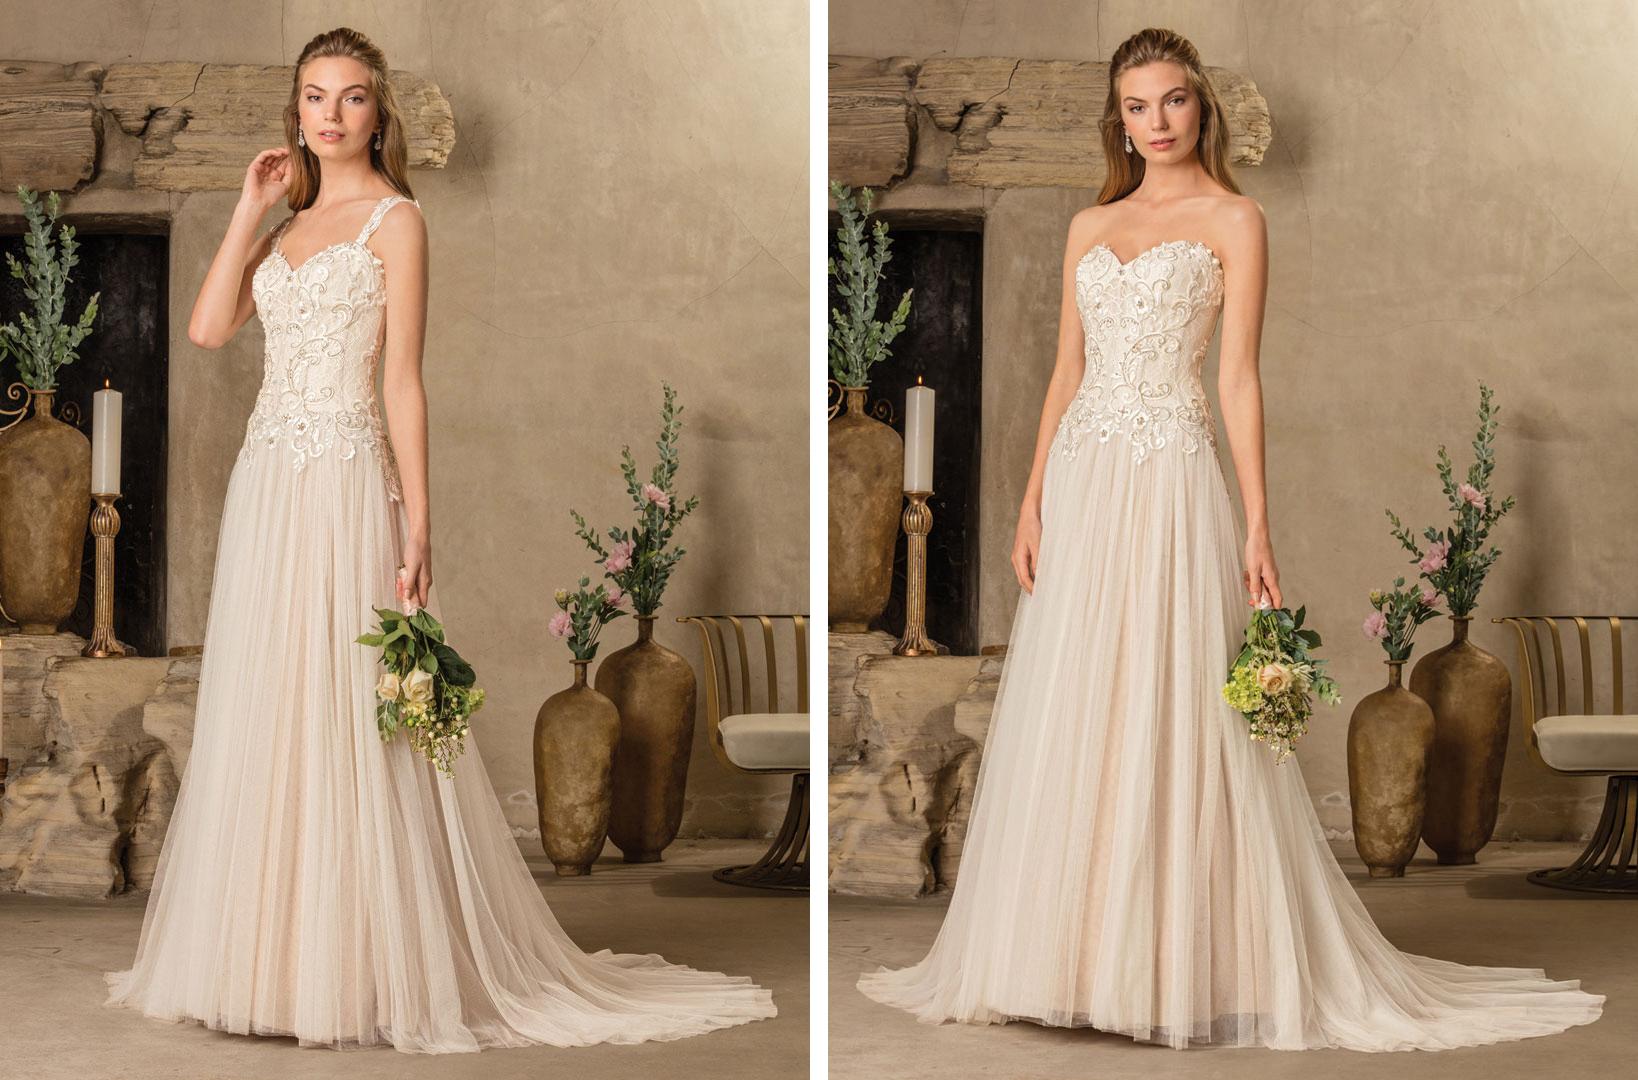 Top Colored Wedding Dresses By Casablanca Bridal / Blog